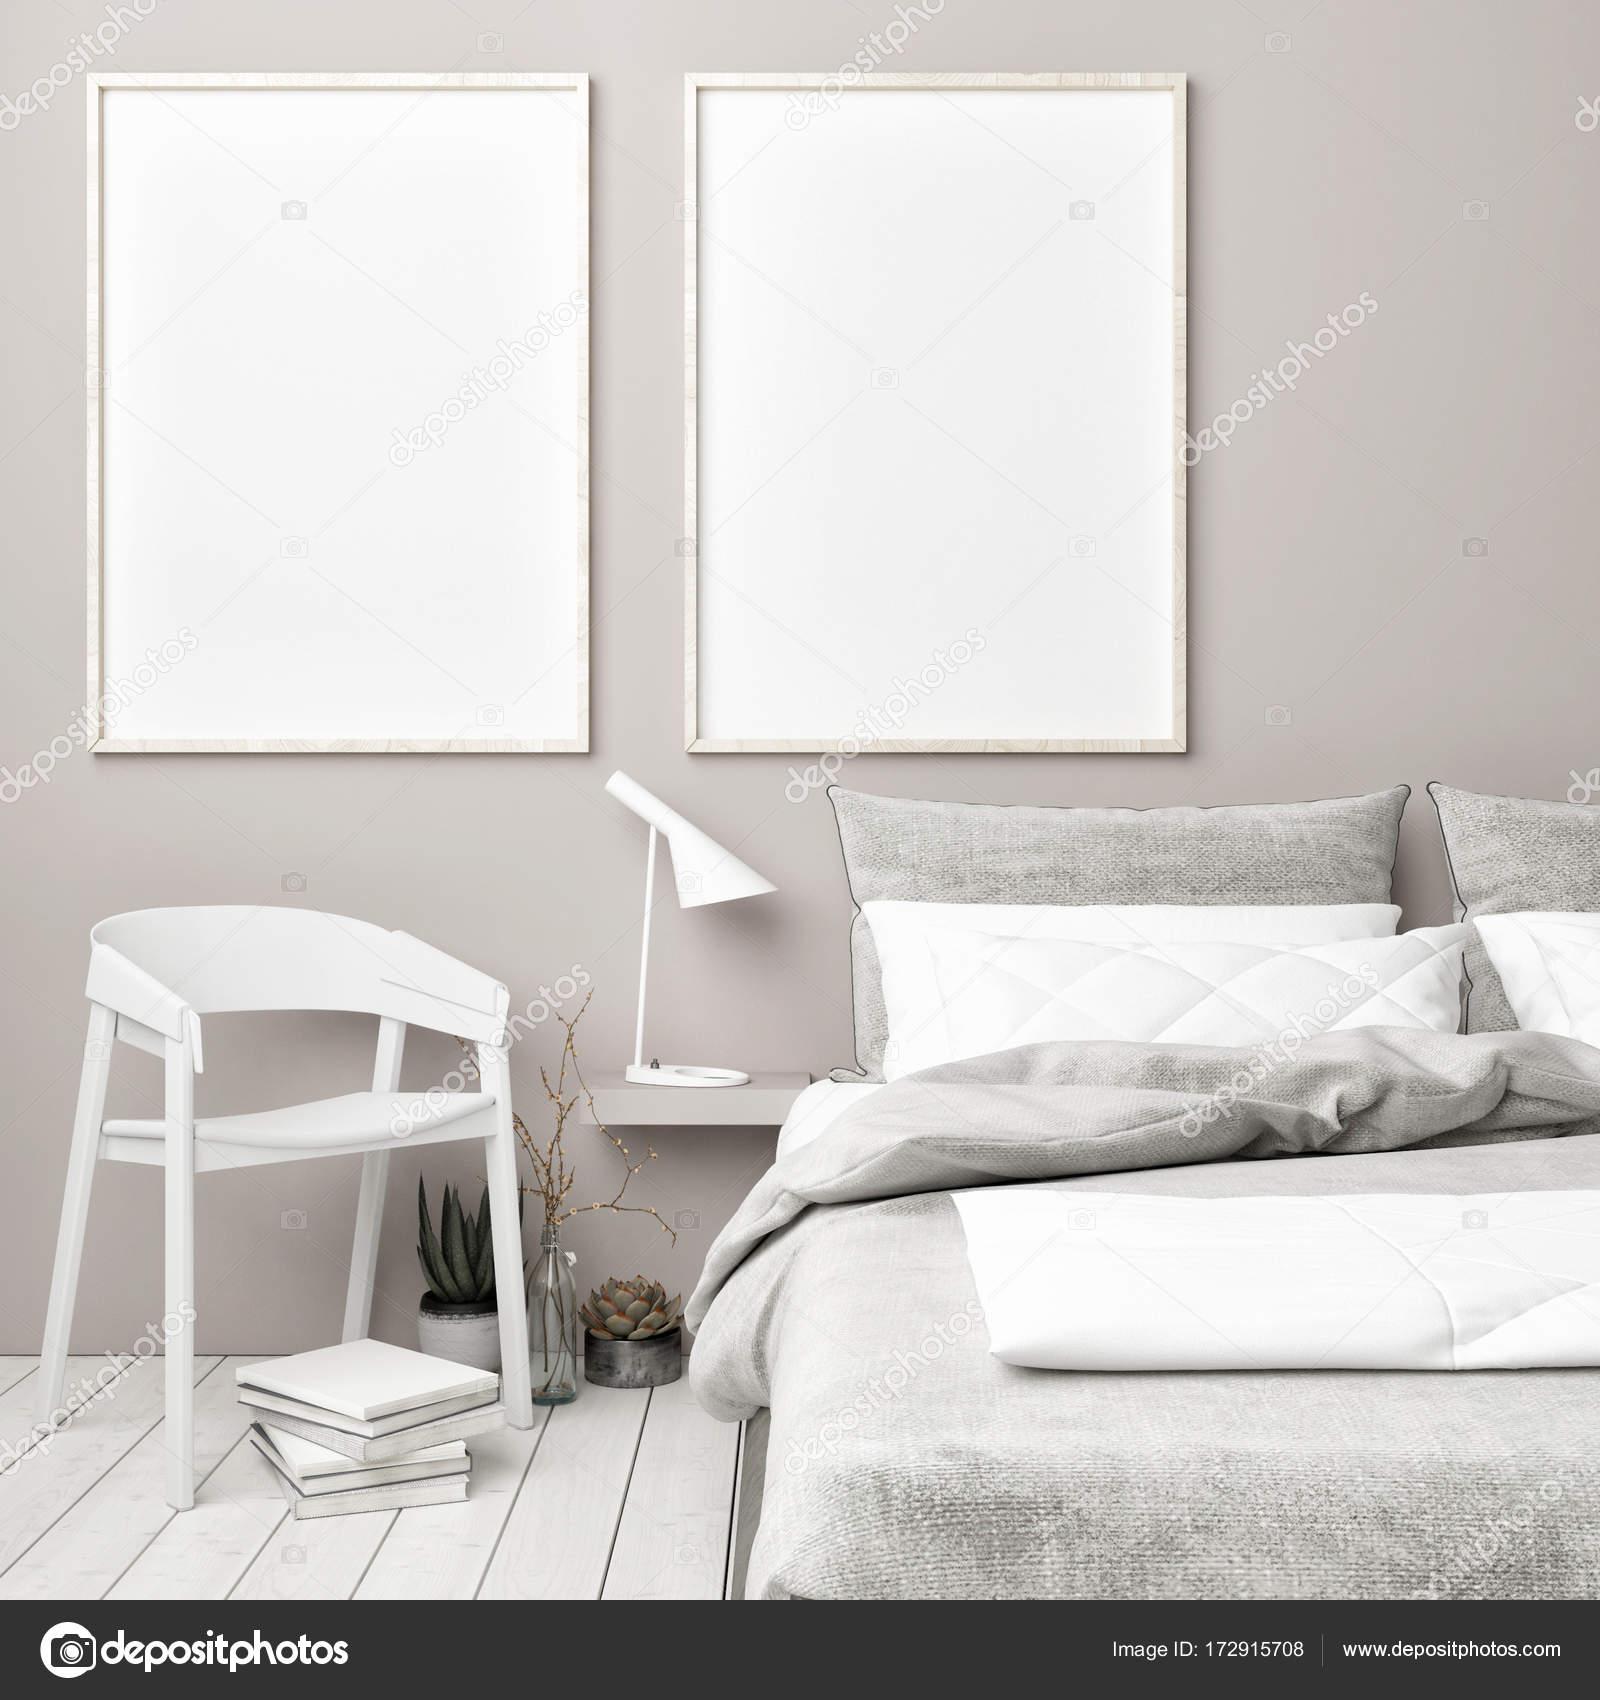 Skandinavische Schlafzimmer mit Mock-up Poster — Stockfoto ...